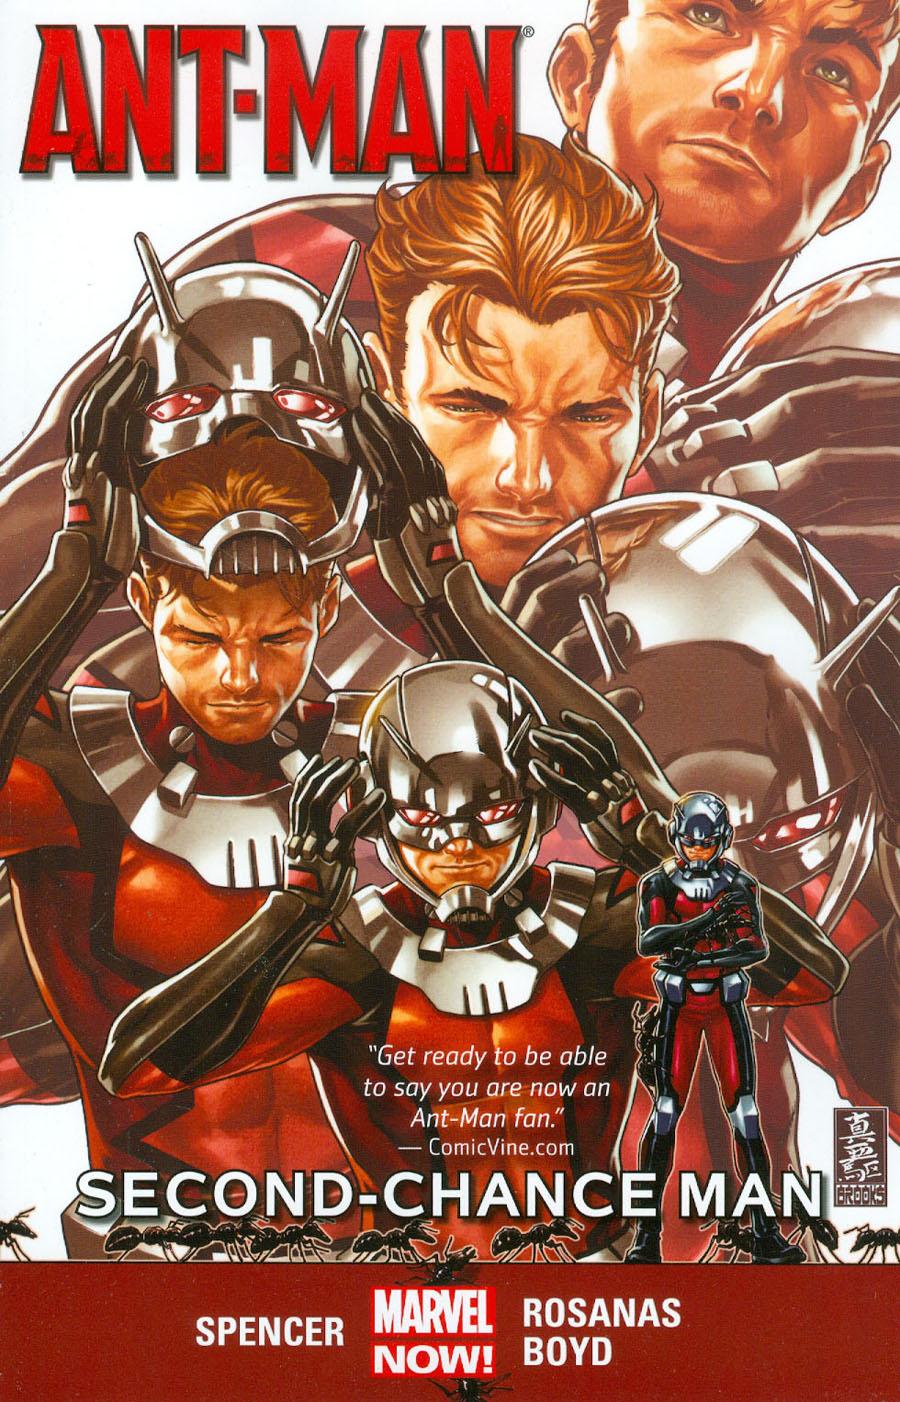 Ant-Man Vol 1 Second-Chance Man TP